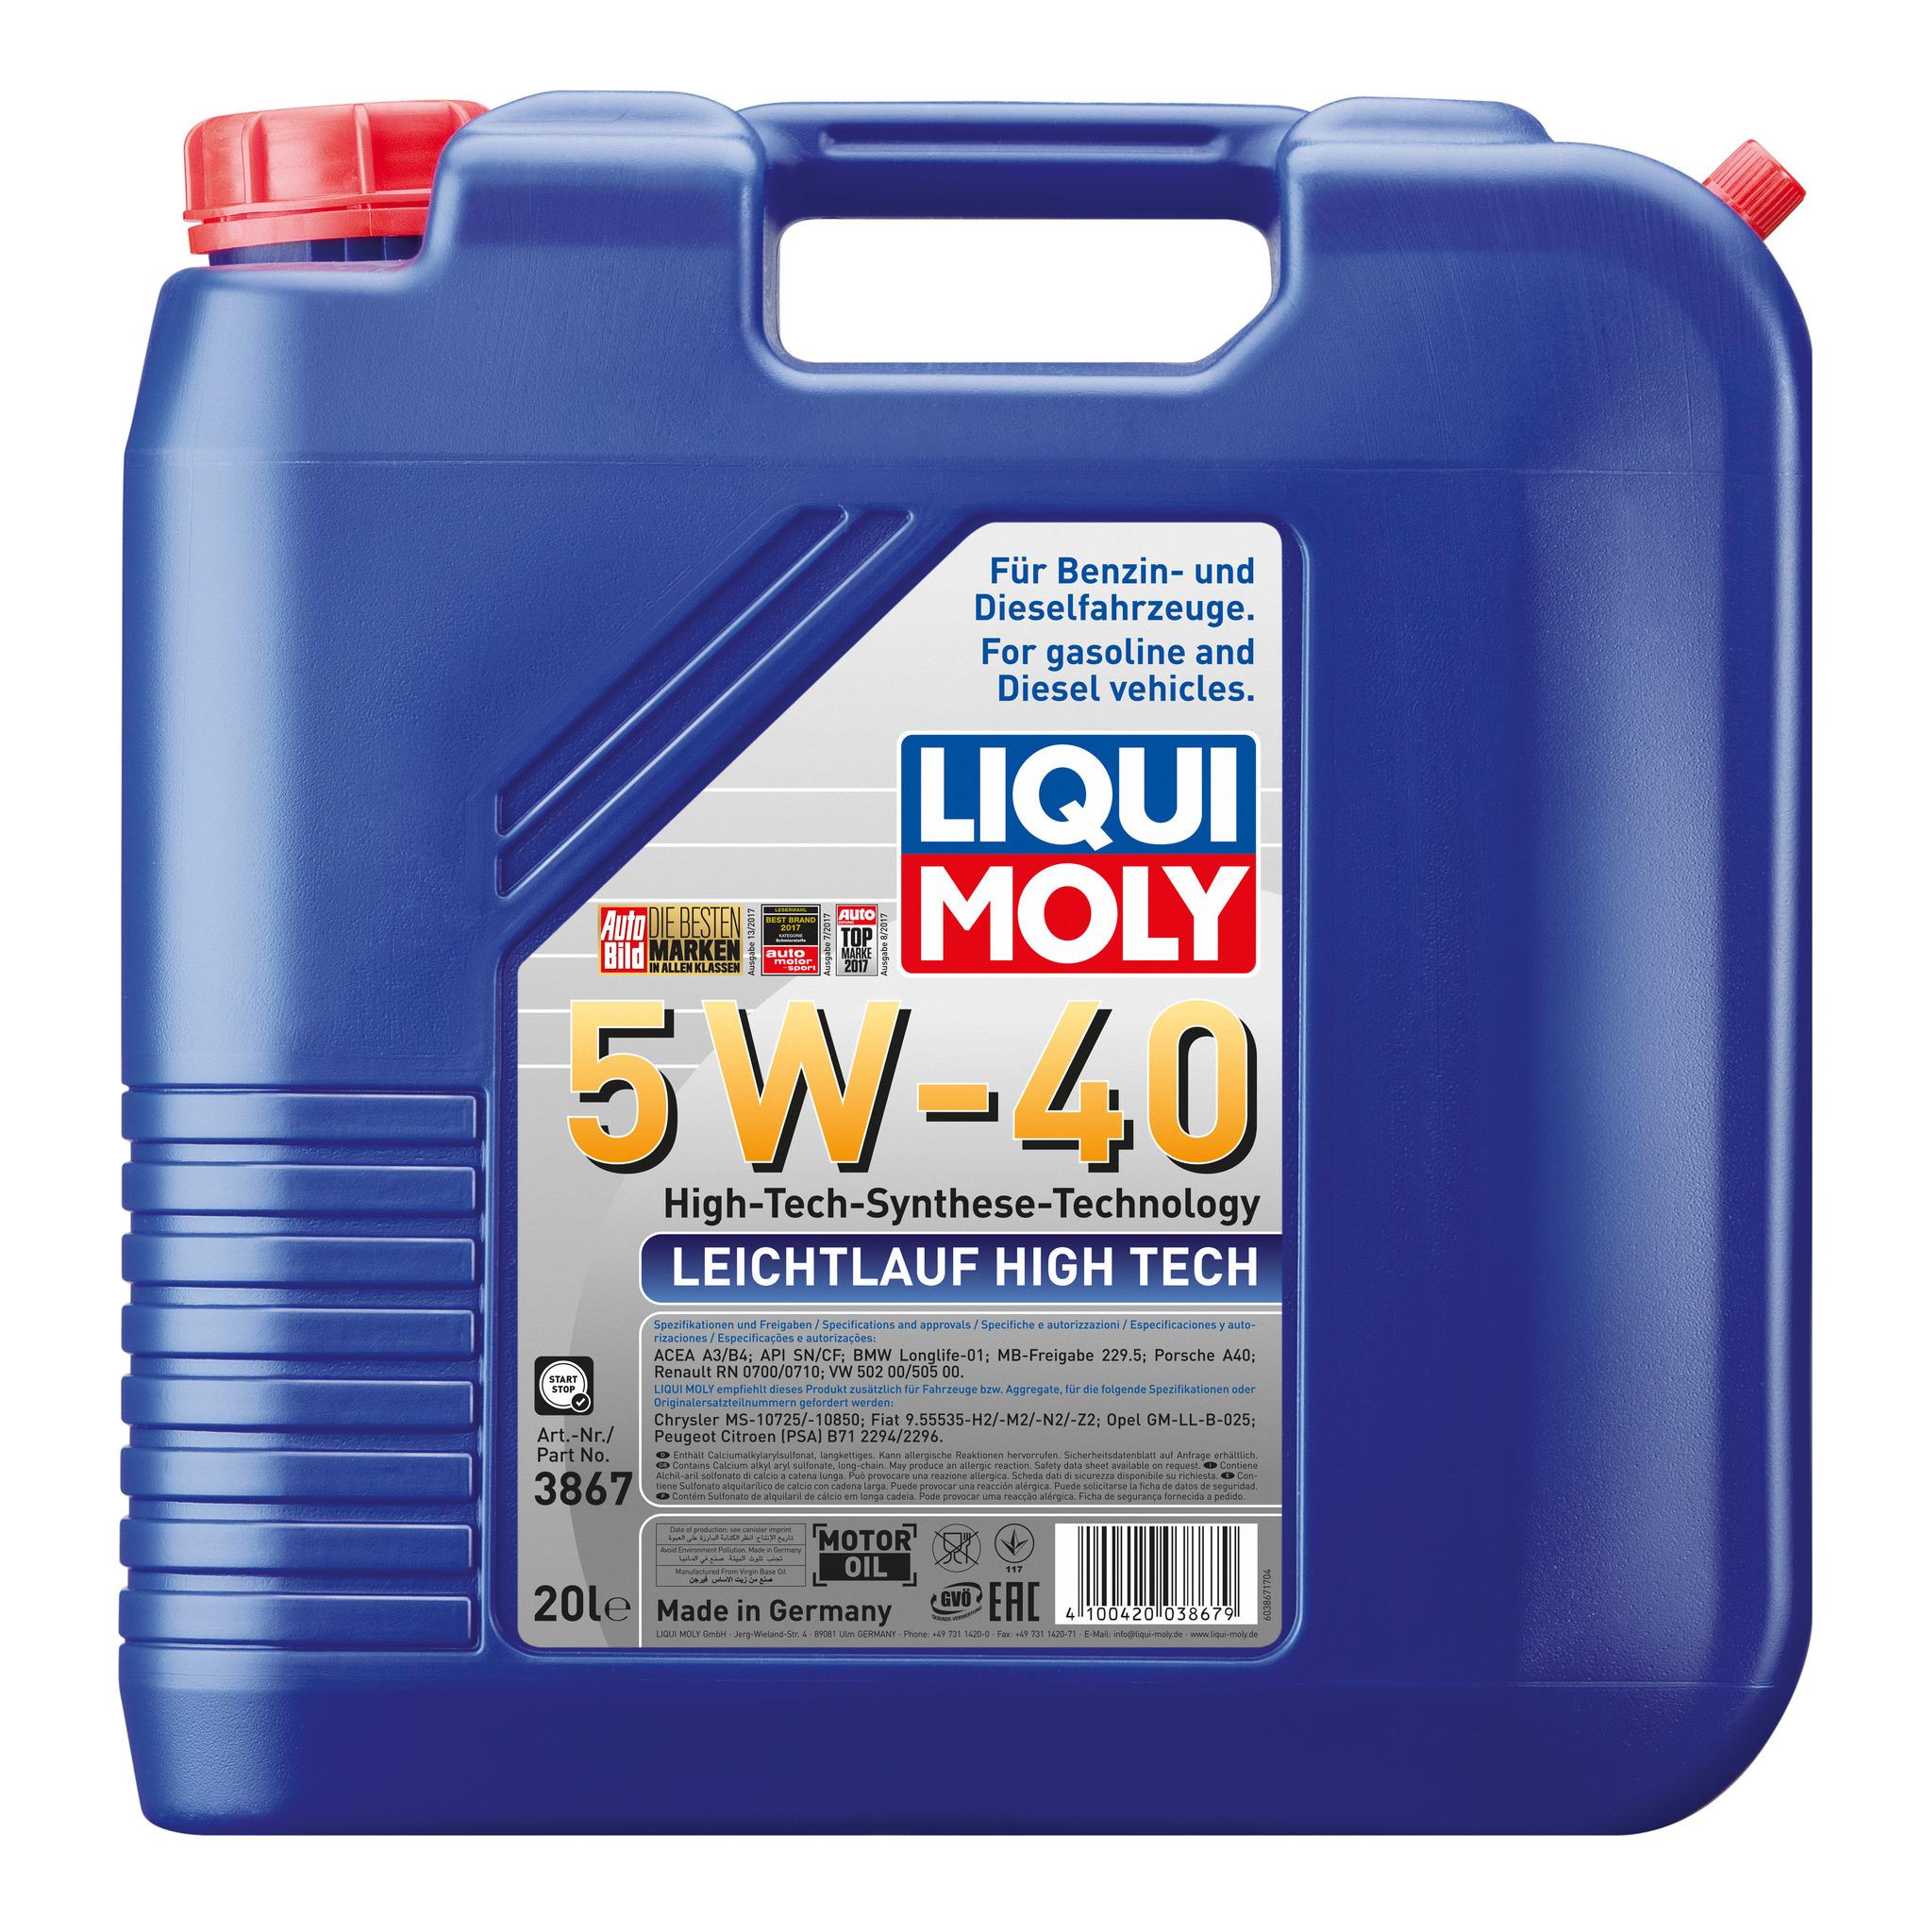 LiquiMoly Leichtlauf High Tech 5W40 HC-синтетическое моторное масло